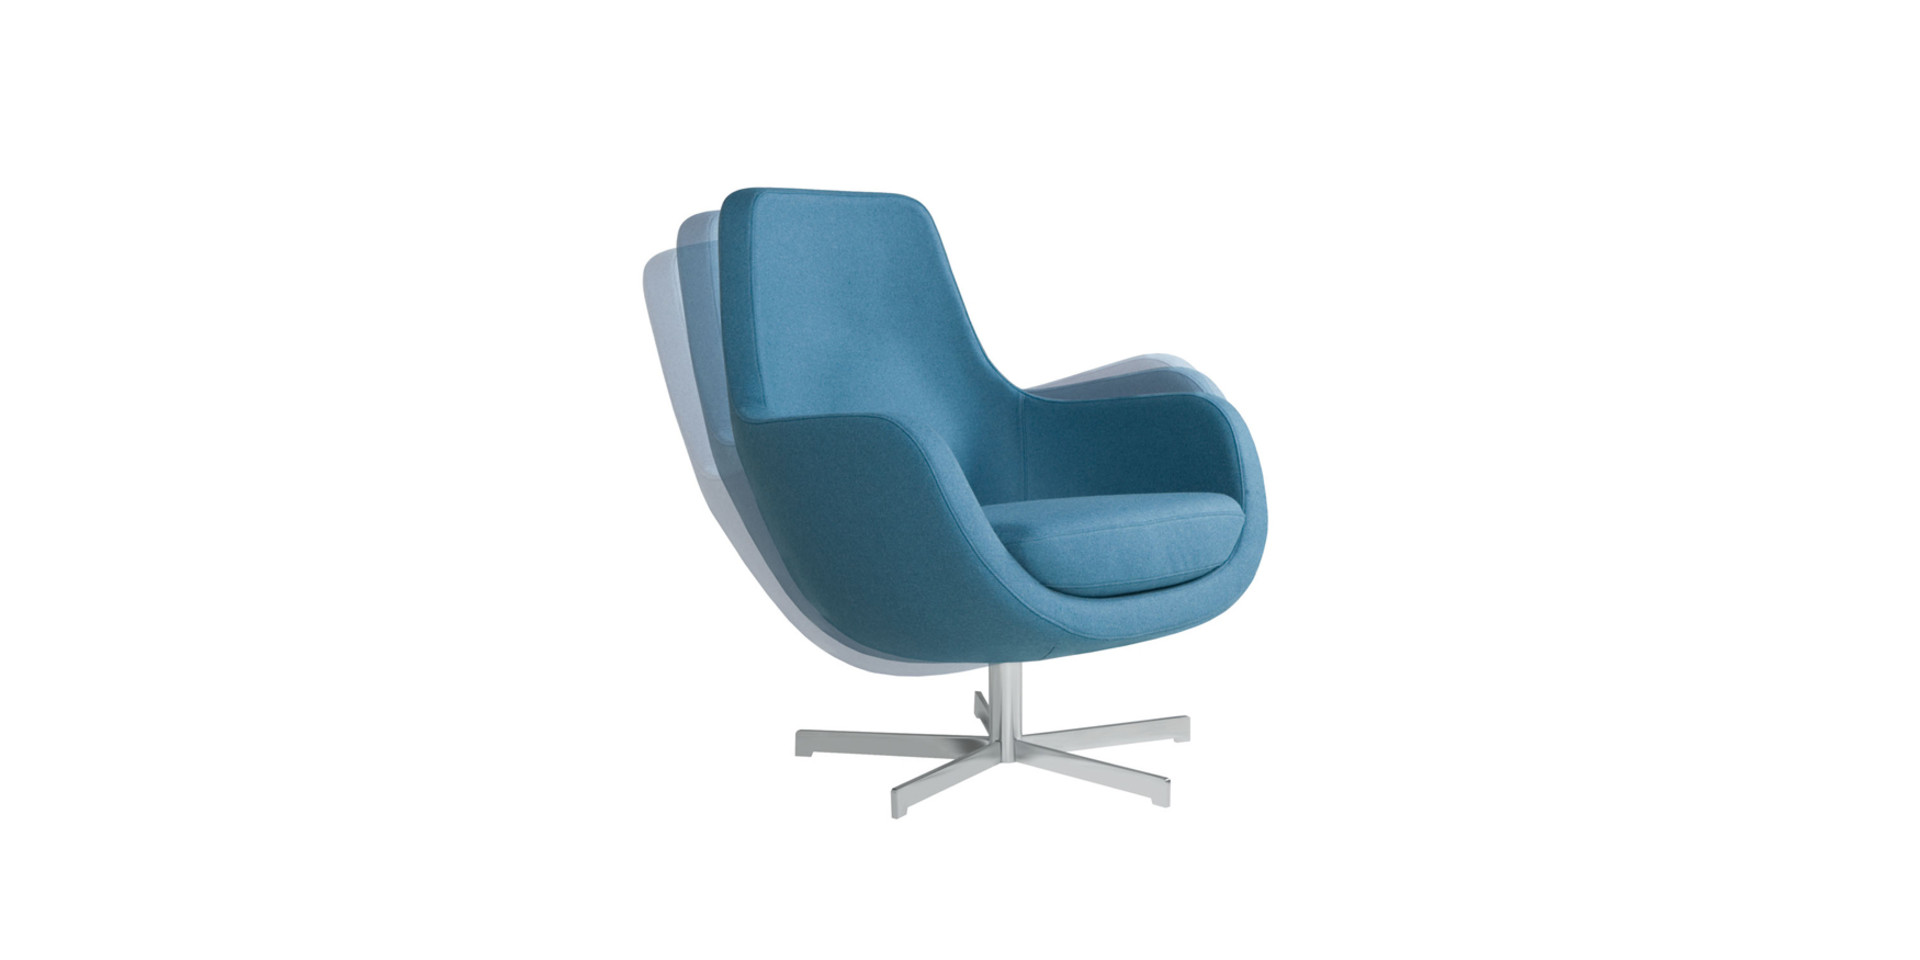 sits-stefani-fauteuil-swivel_panno2240_turquoise_5